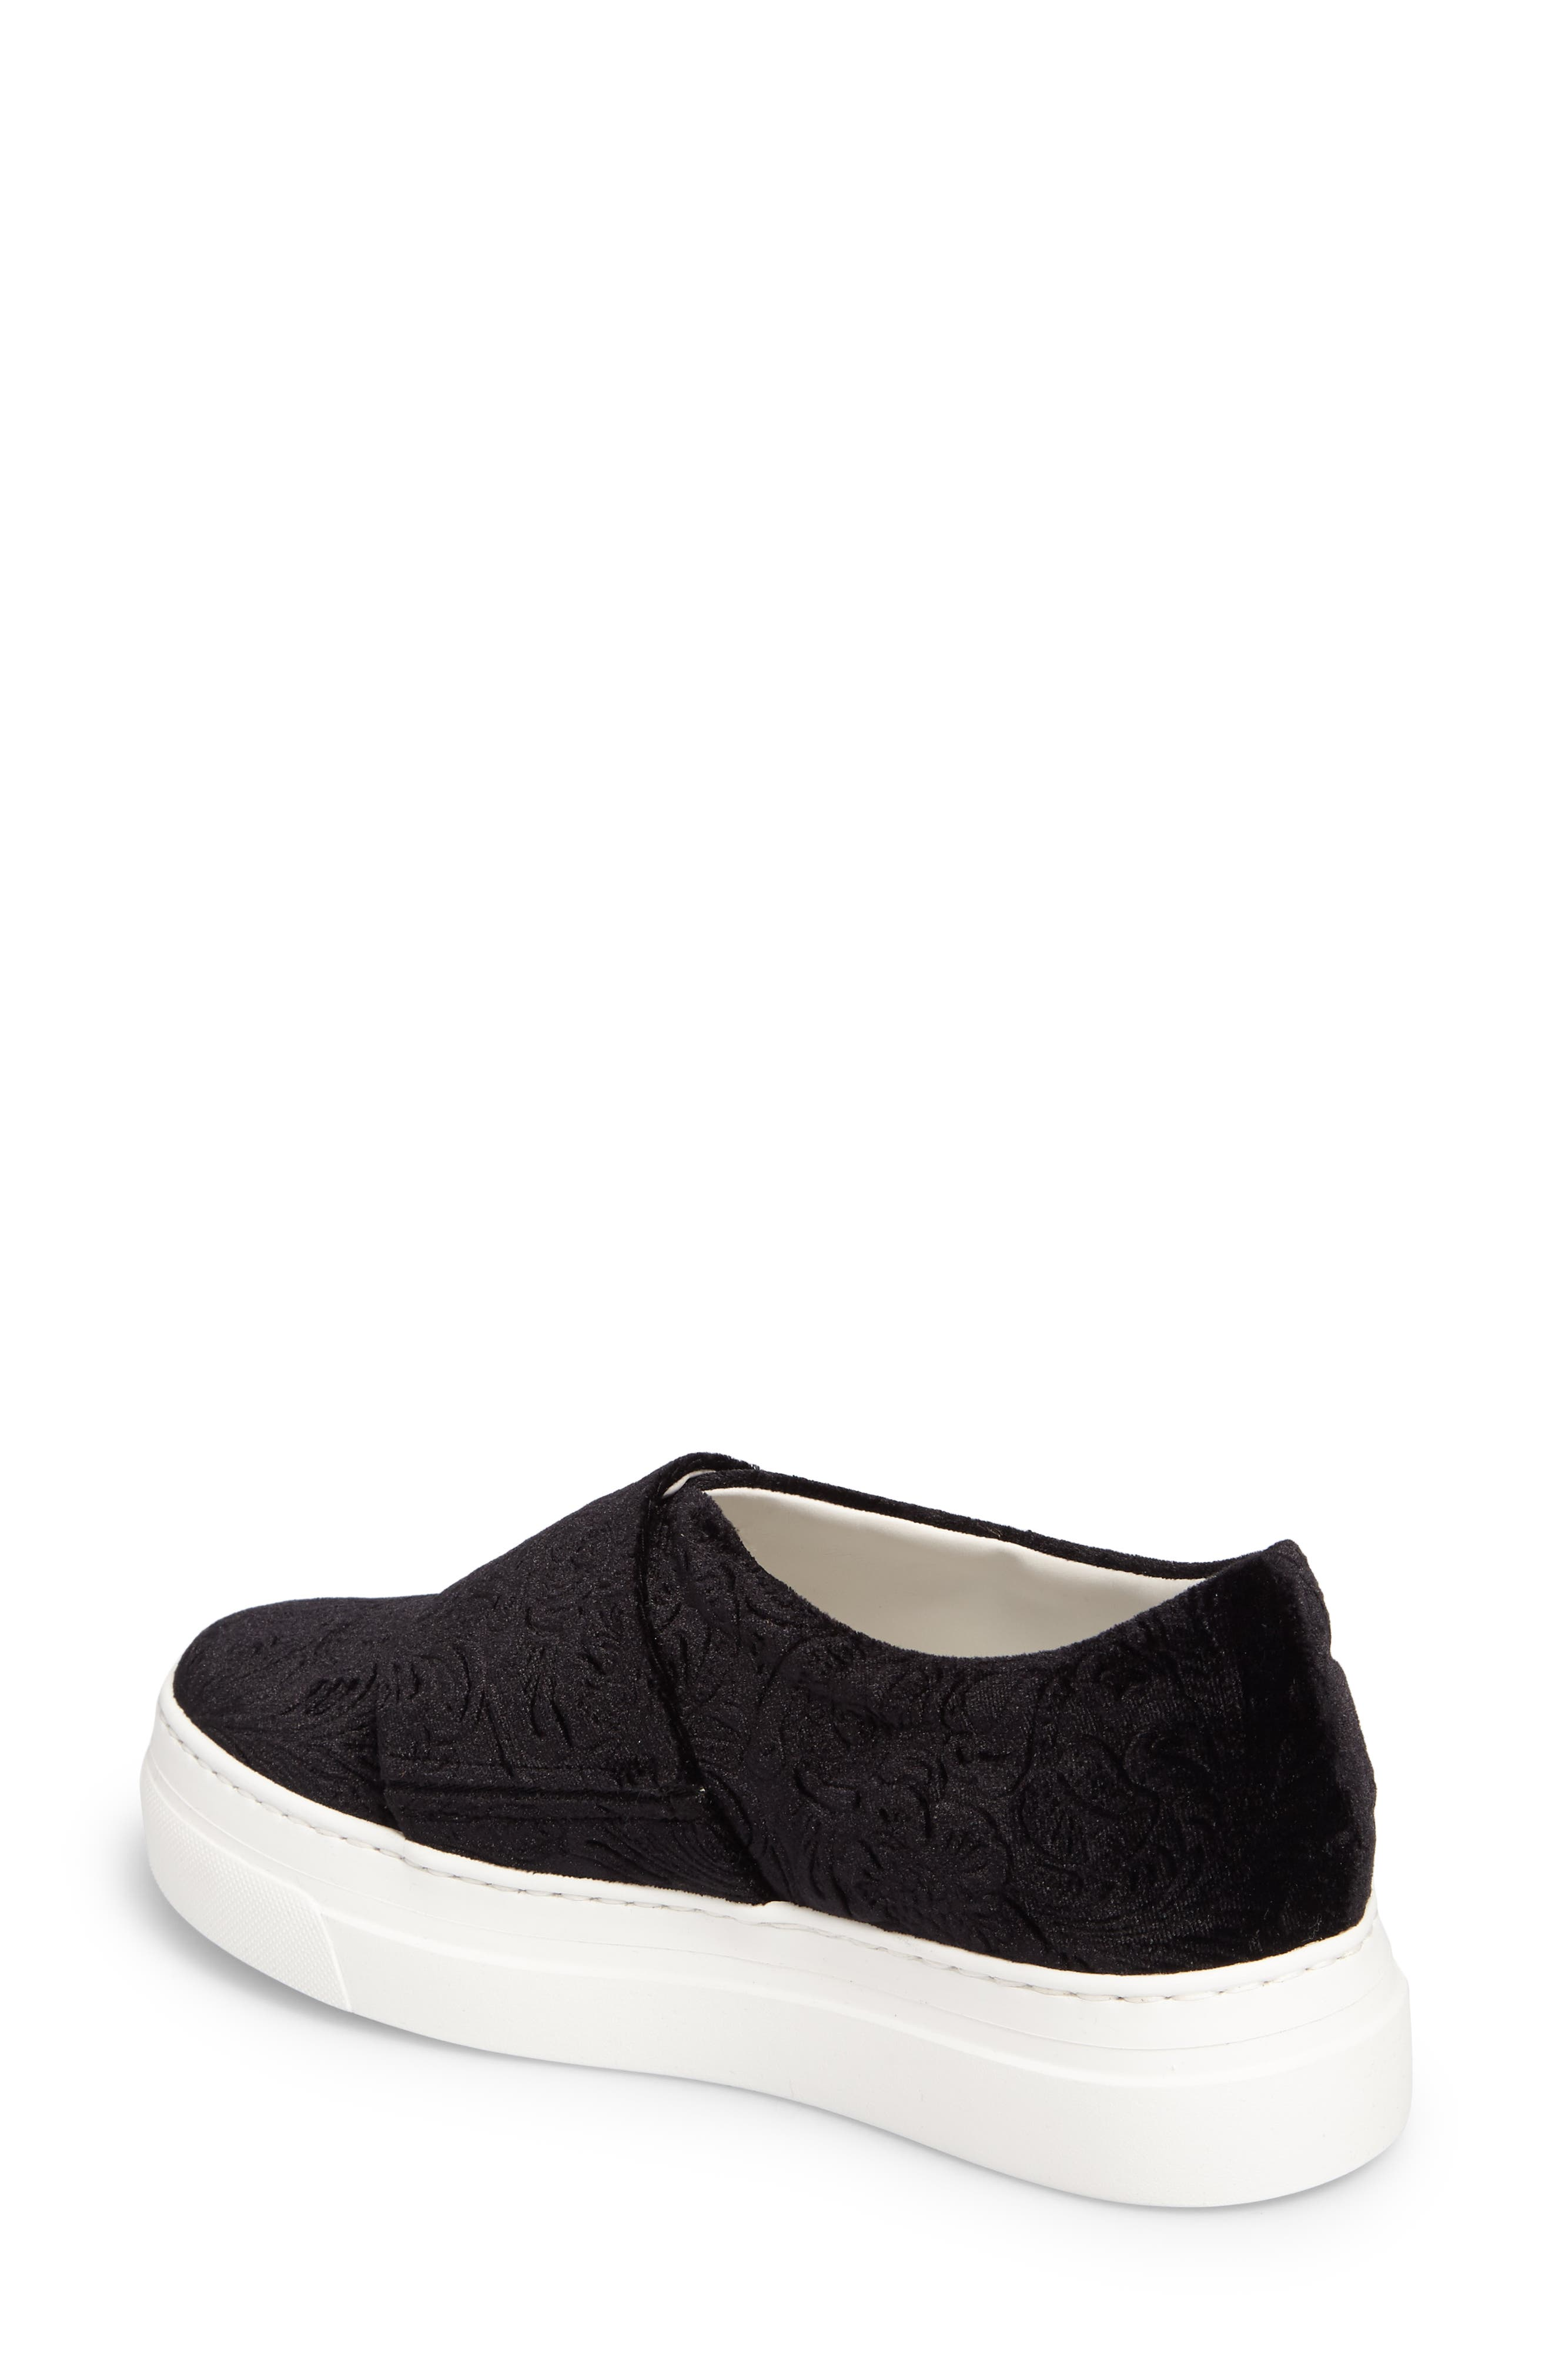 Alternate Image 2  - Lewit Arlo Slip-On Platform Sneaker (Women)